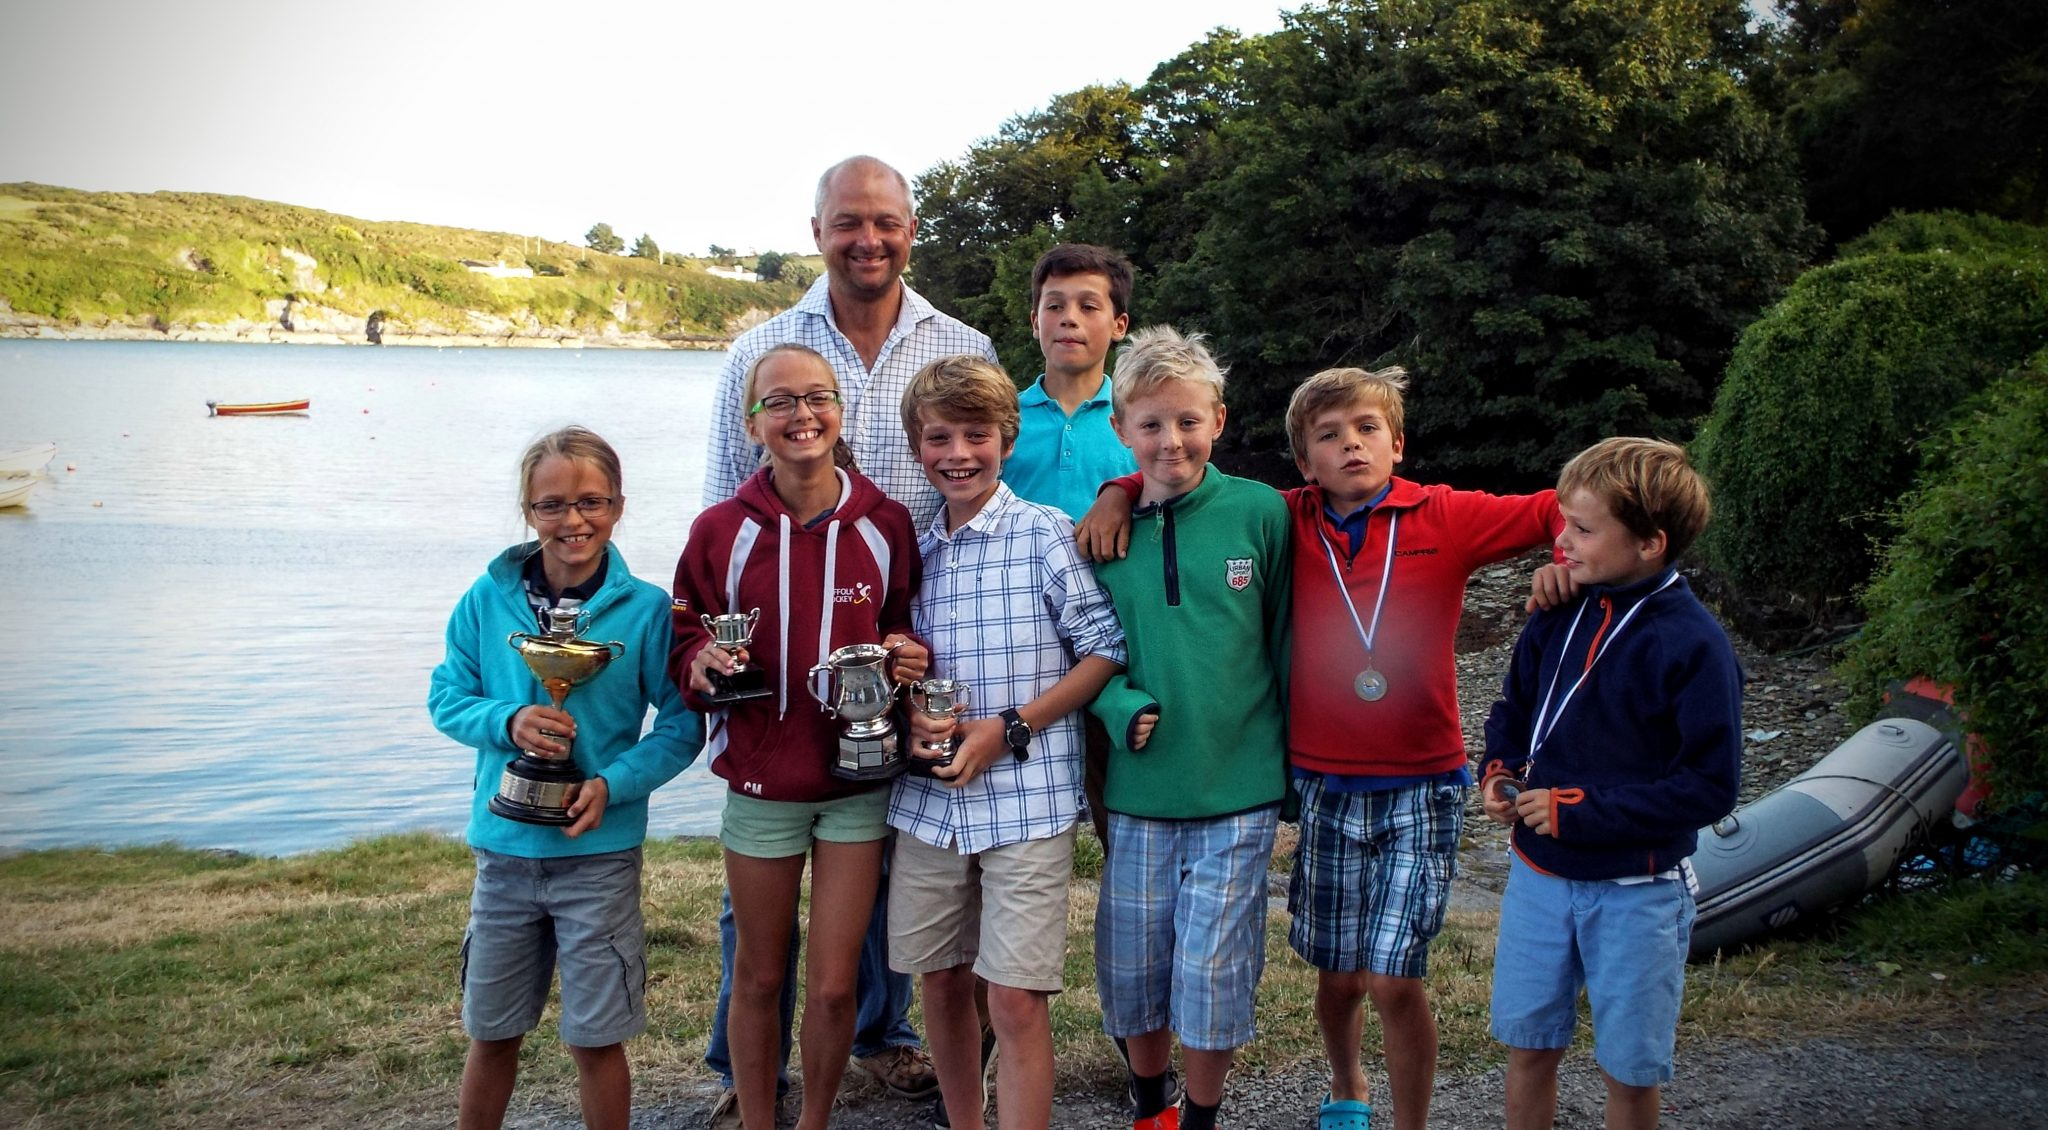 SCSC 2016 Award Winners